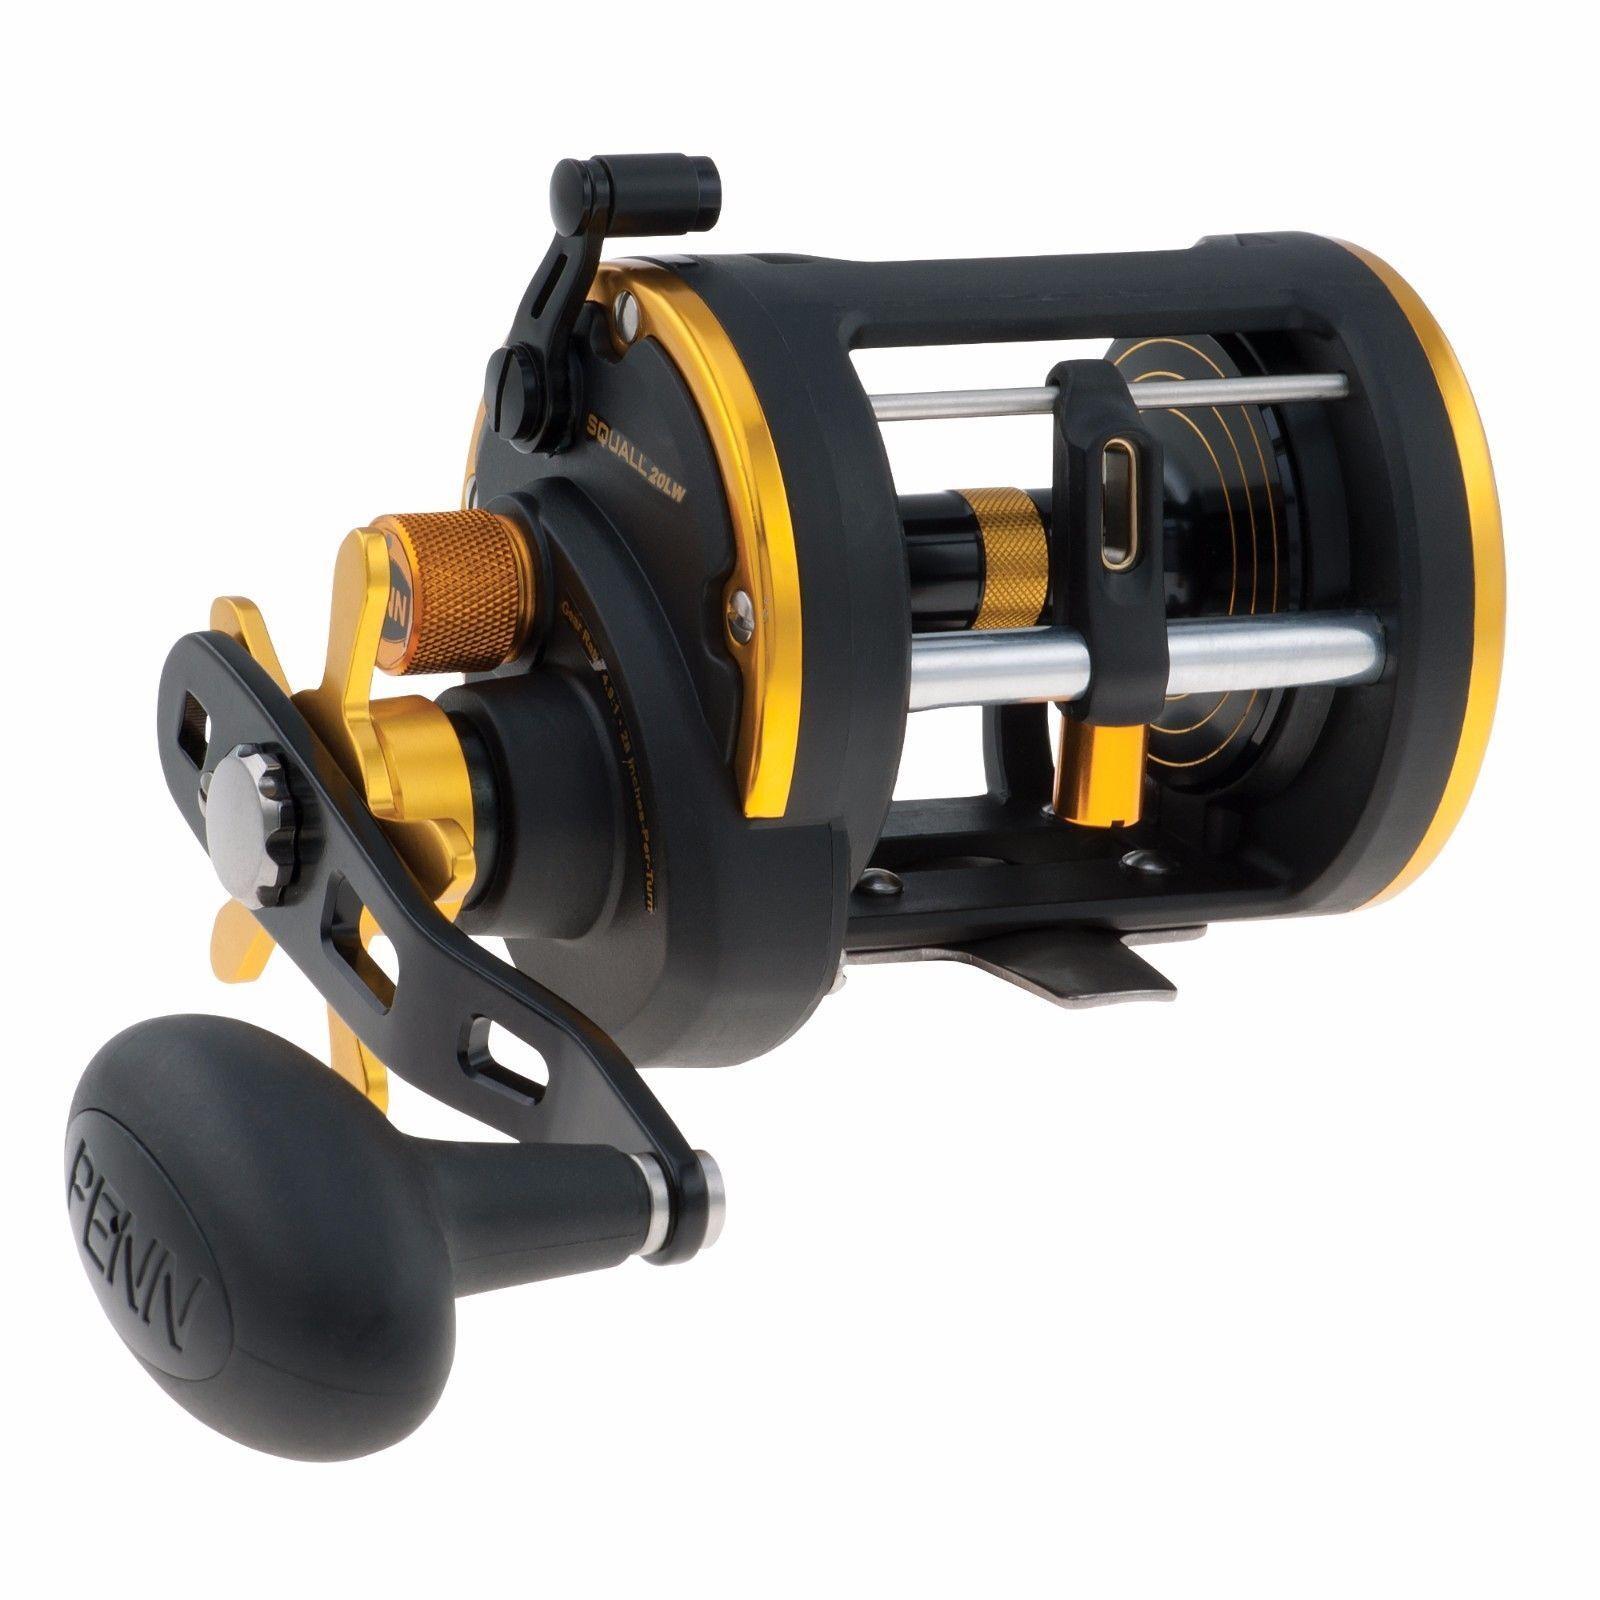 Penn Squall Level Wind Multiplier/Fishing Reels - All Models